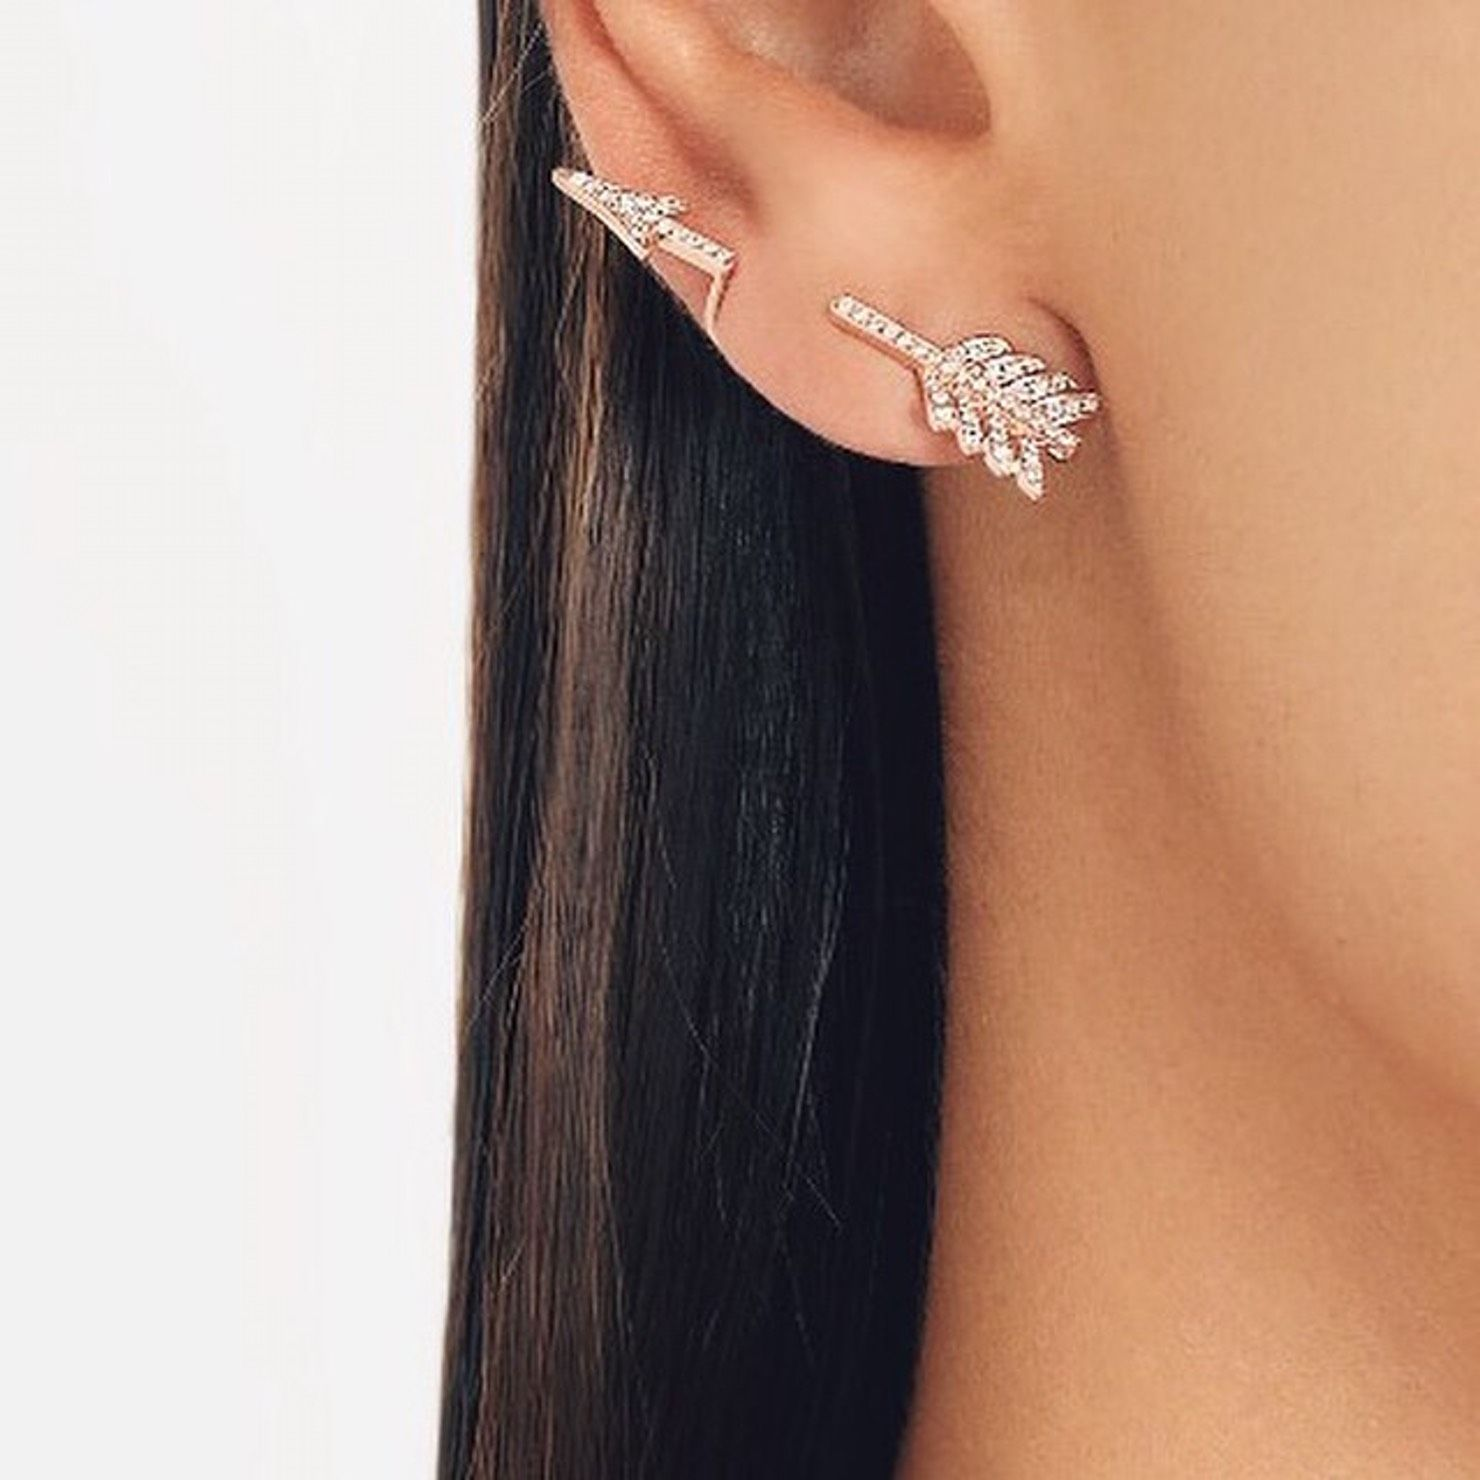 Pretty piercing ideas   Unique Ear Piercing Ideas  Unique ear piercings Ear piercings